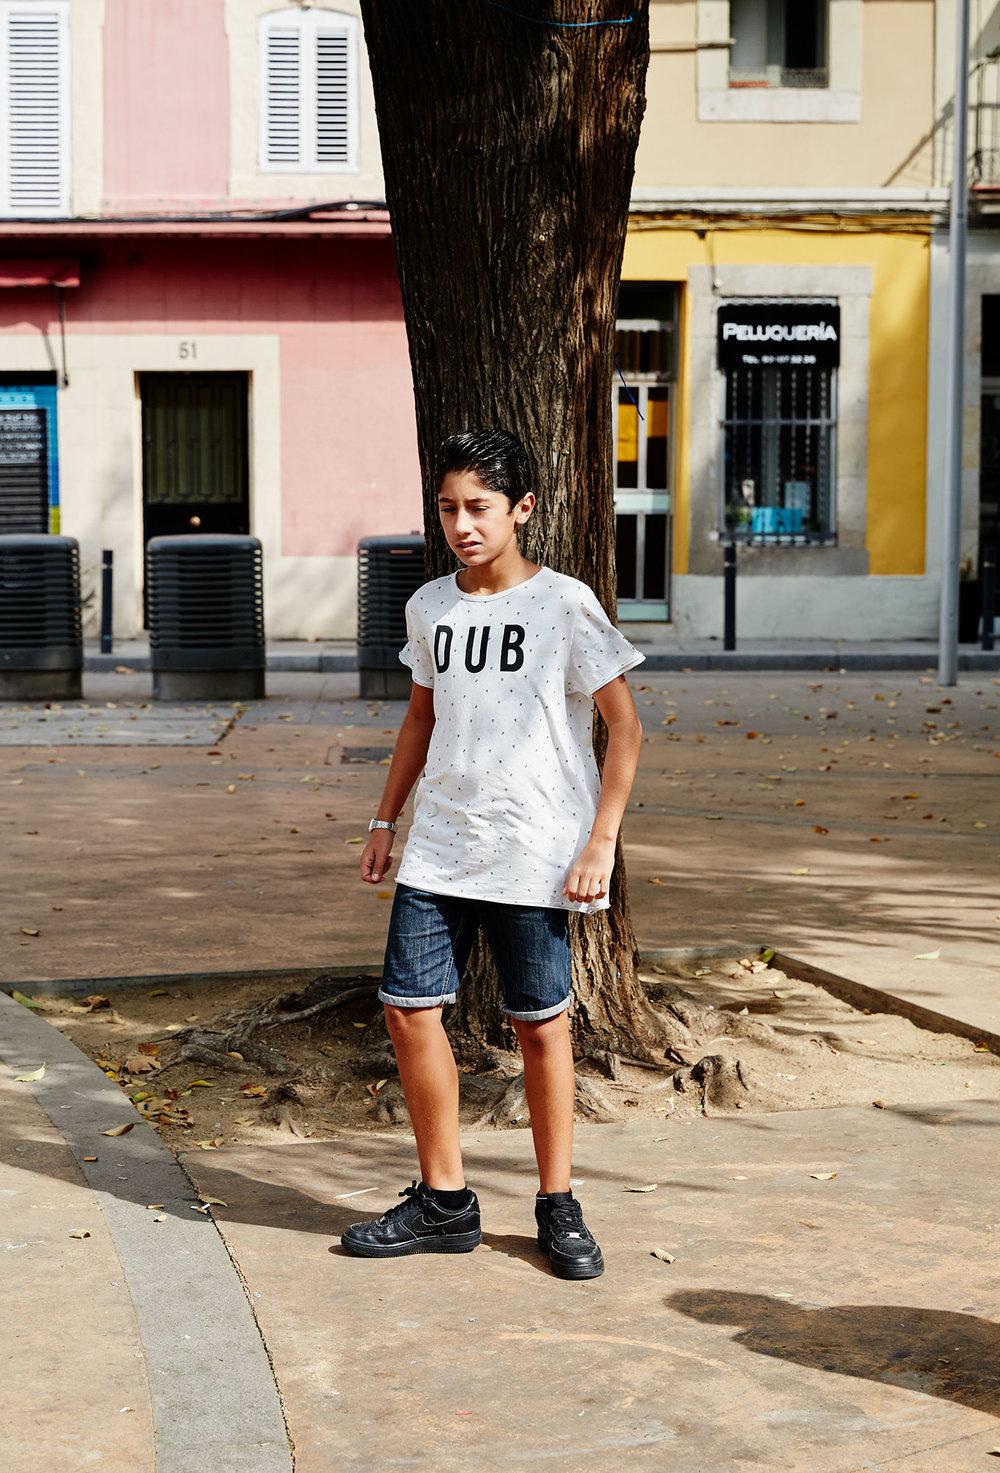 barcelona_15_324.jpg